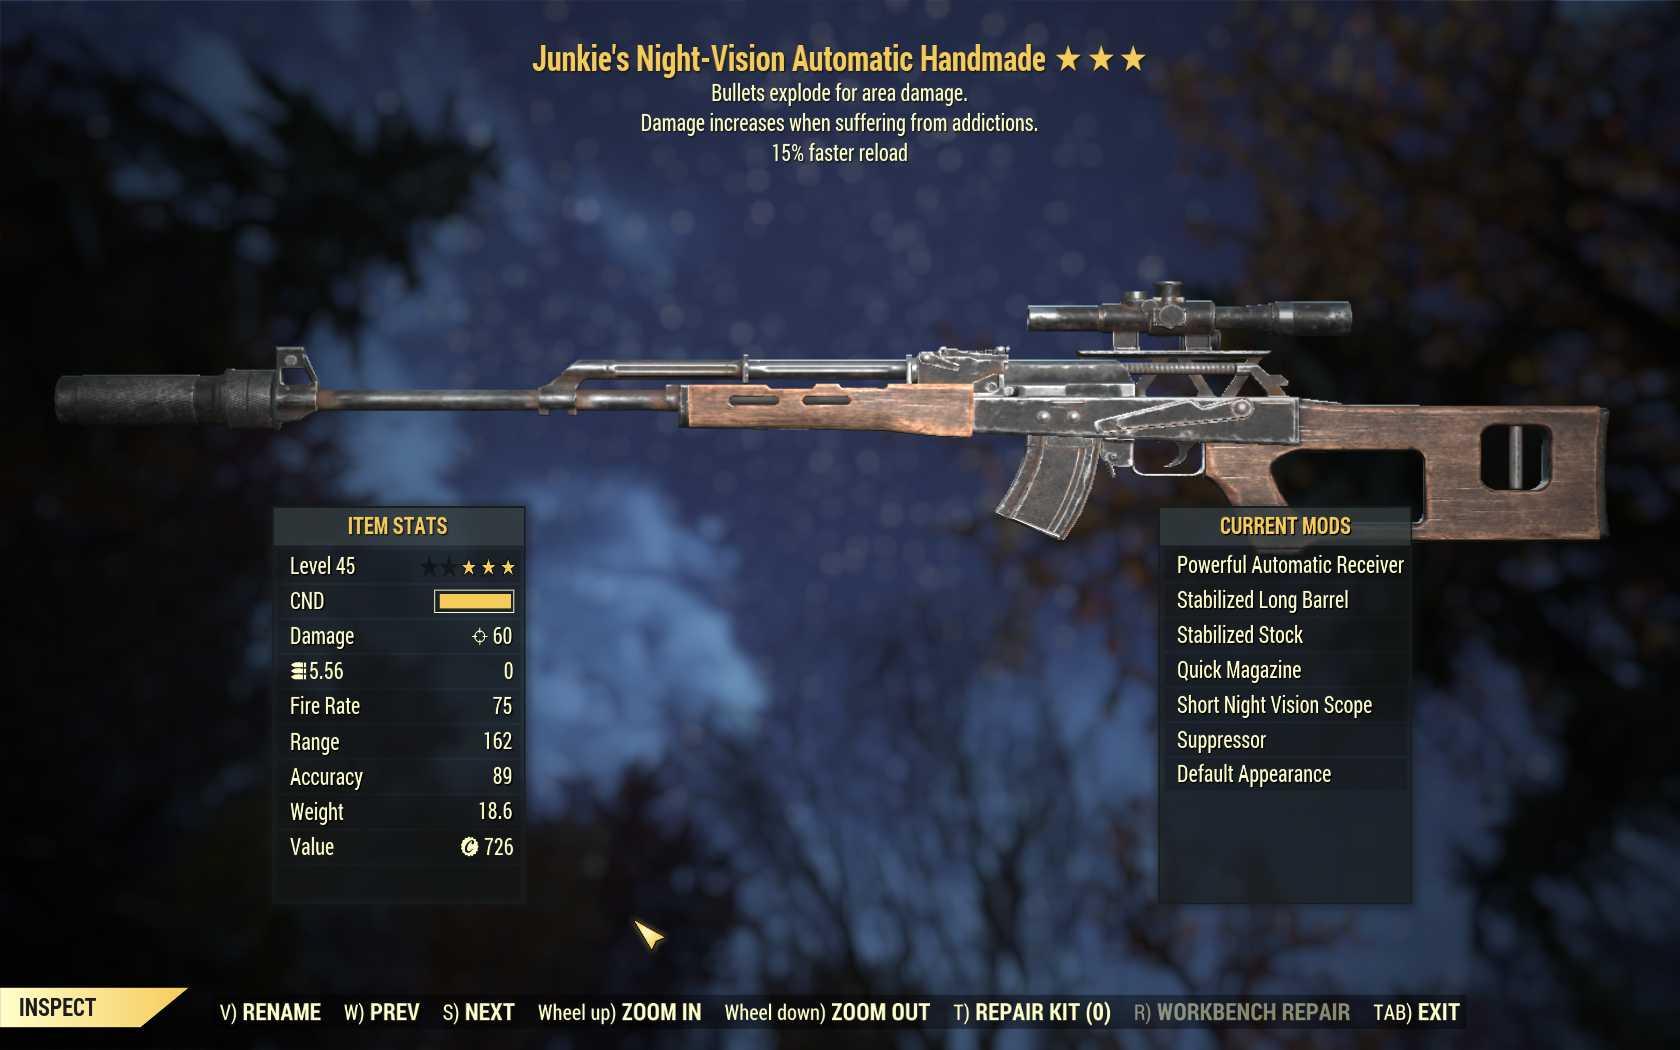 Junkie's Explosive Handmade (15% faster reload)